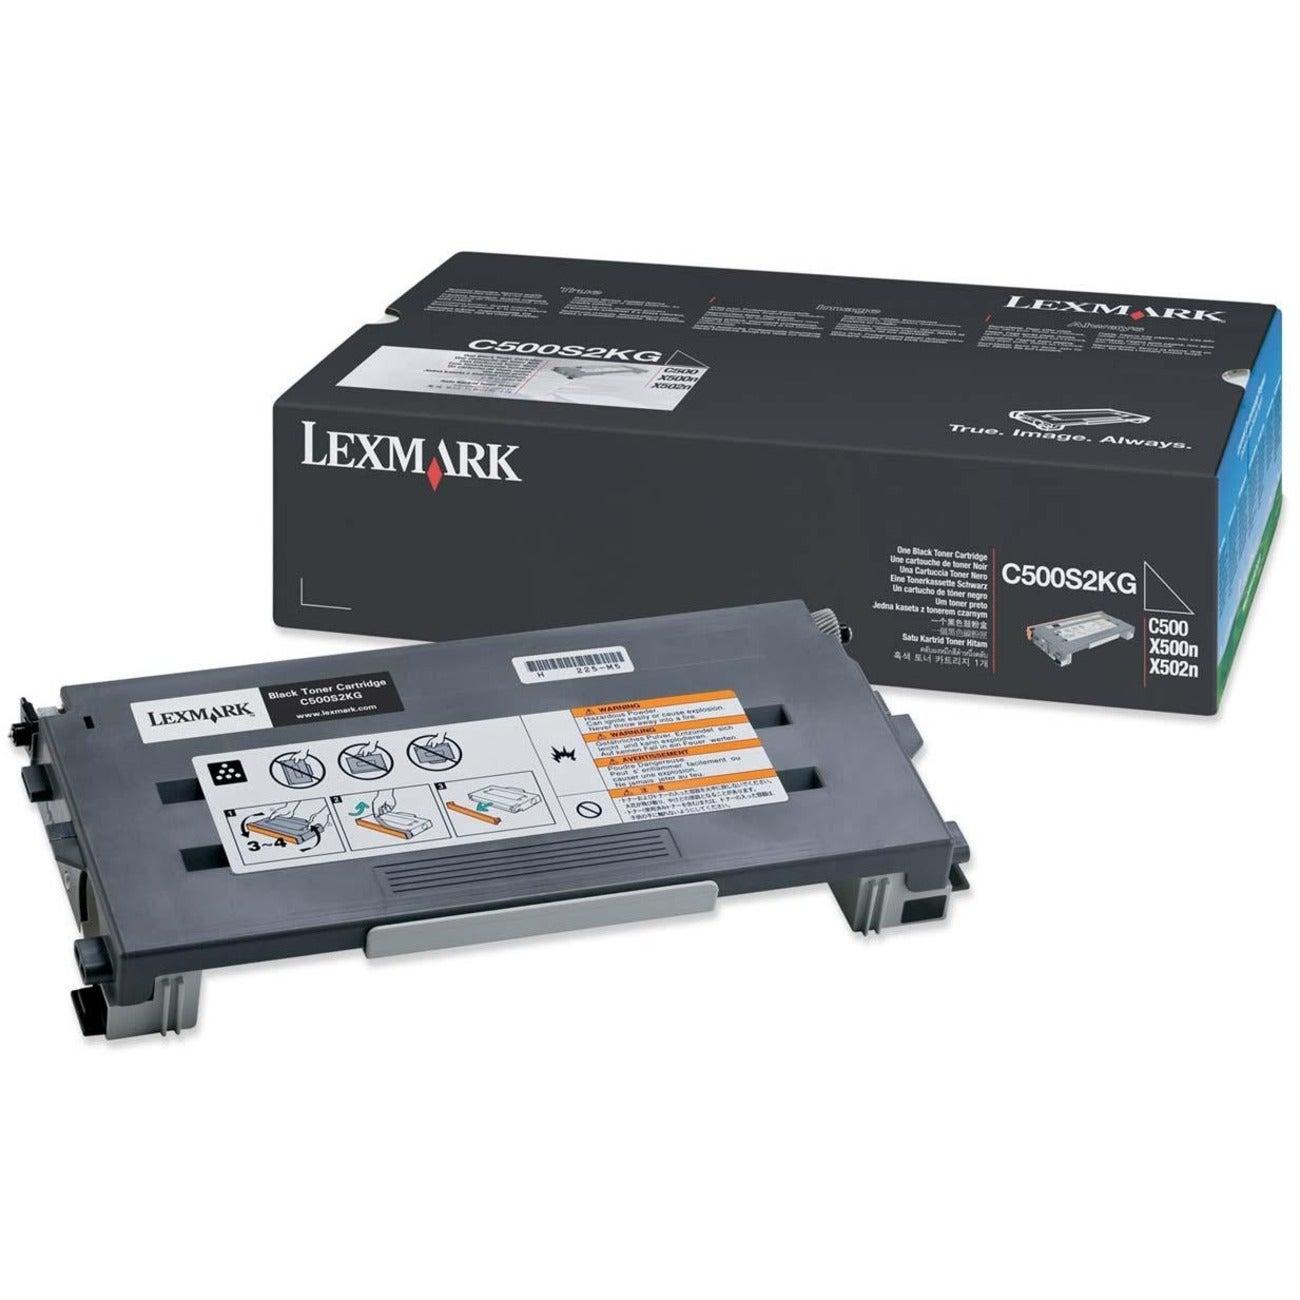 Lexmark Toner Cartridge (Black)